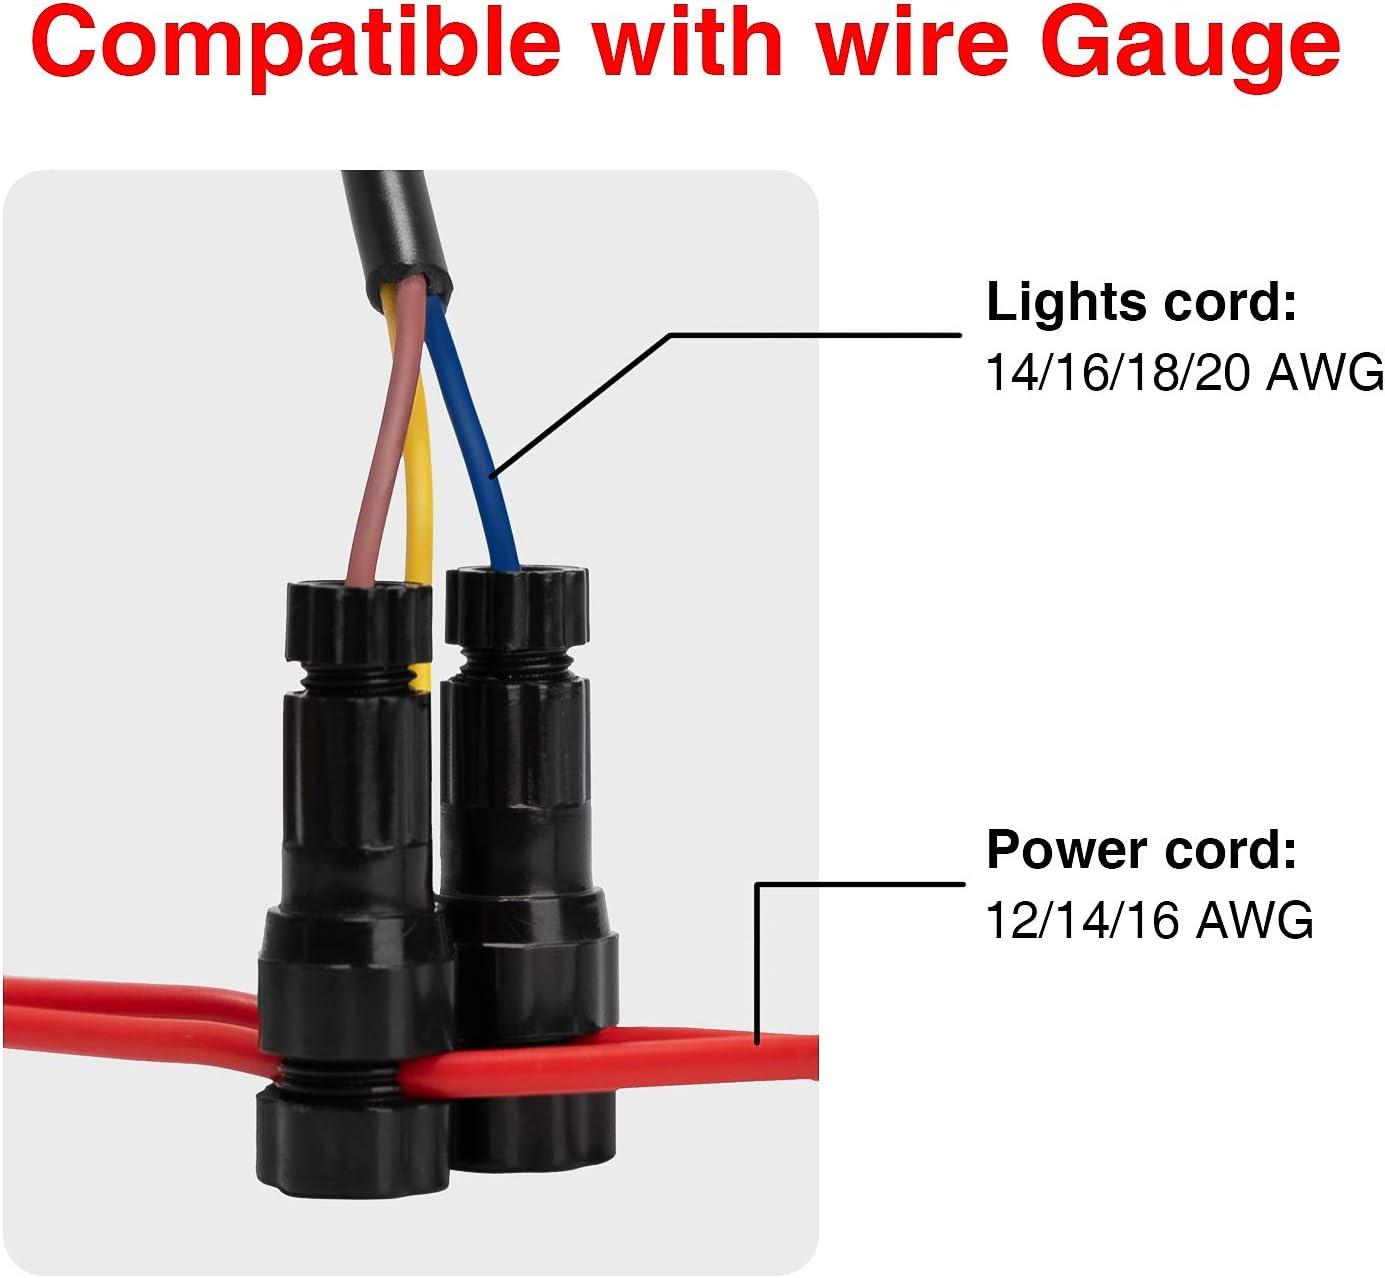 10 Pack Landscape Low Voltage Wire Connector Fast Lock Landscape Lights Cable Connector 12 14 Gauge